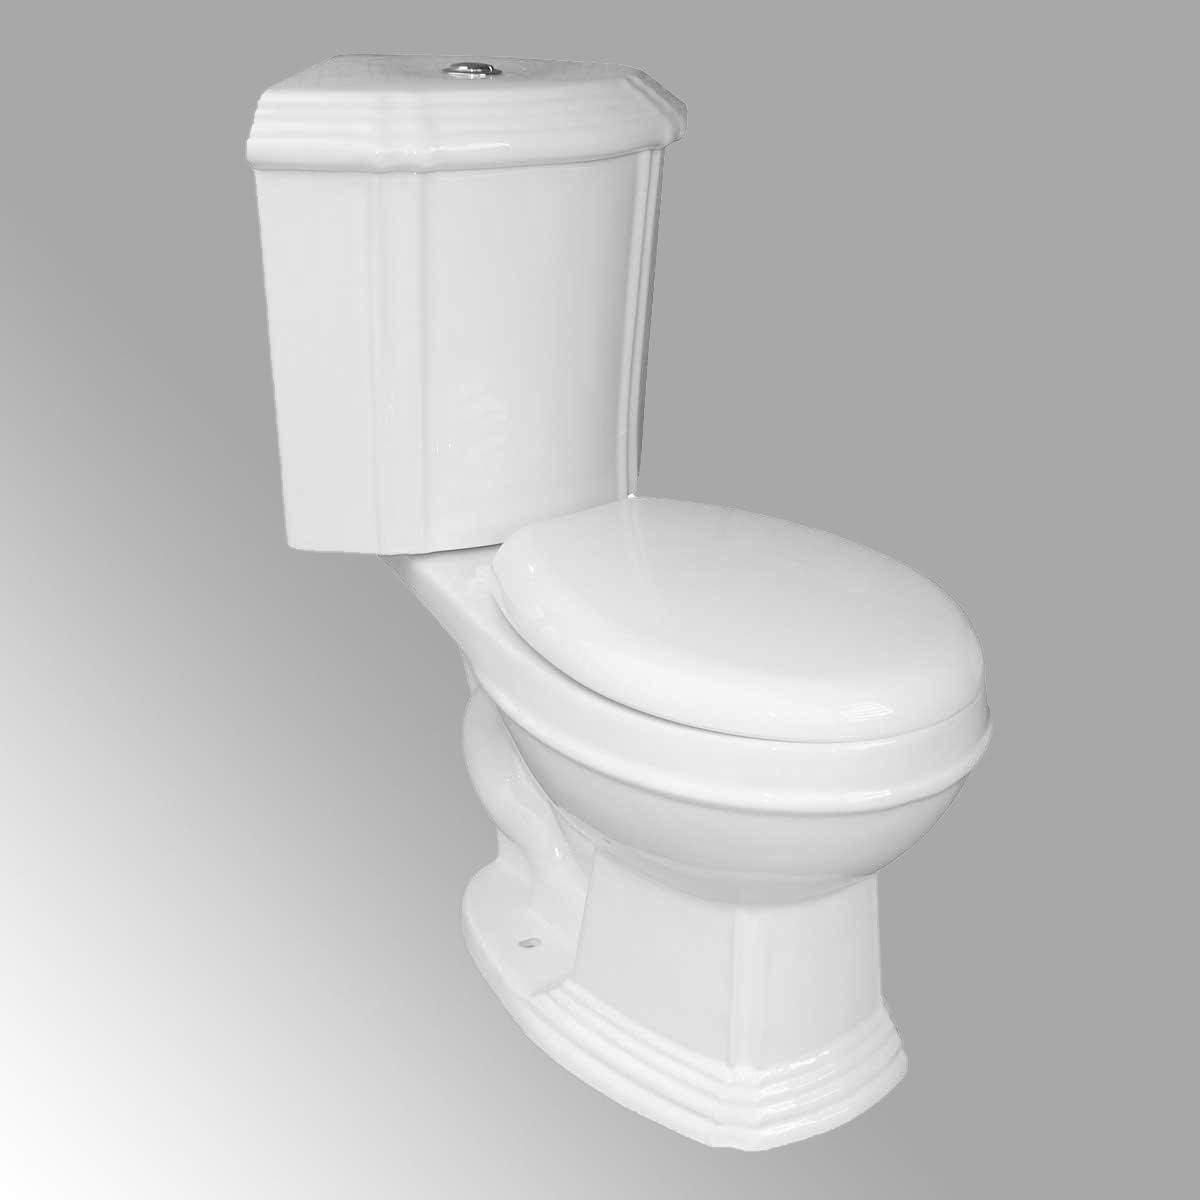 Renovator's Sheffield 2-Piece Corner Toilet